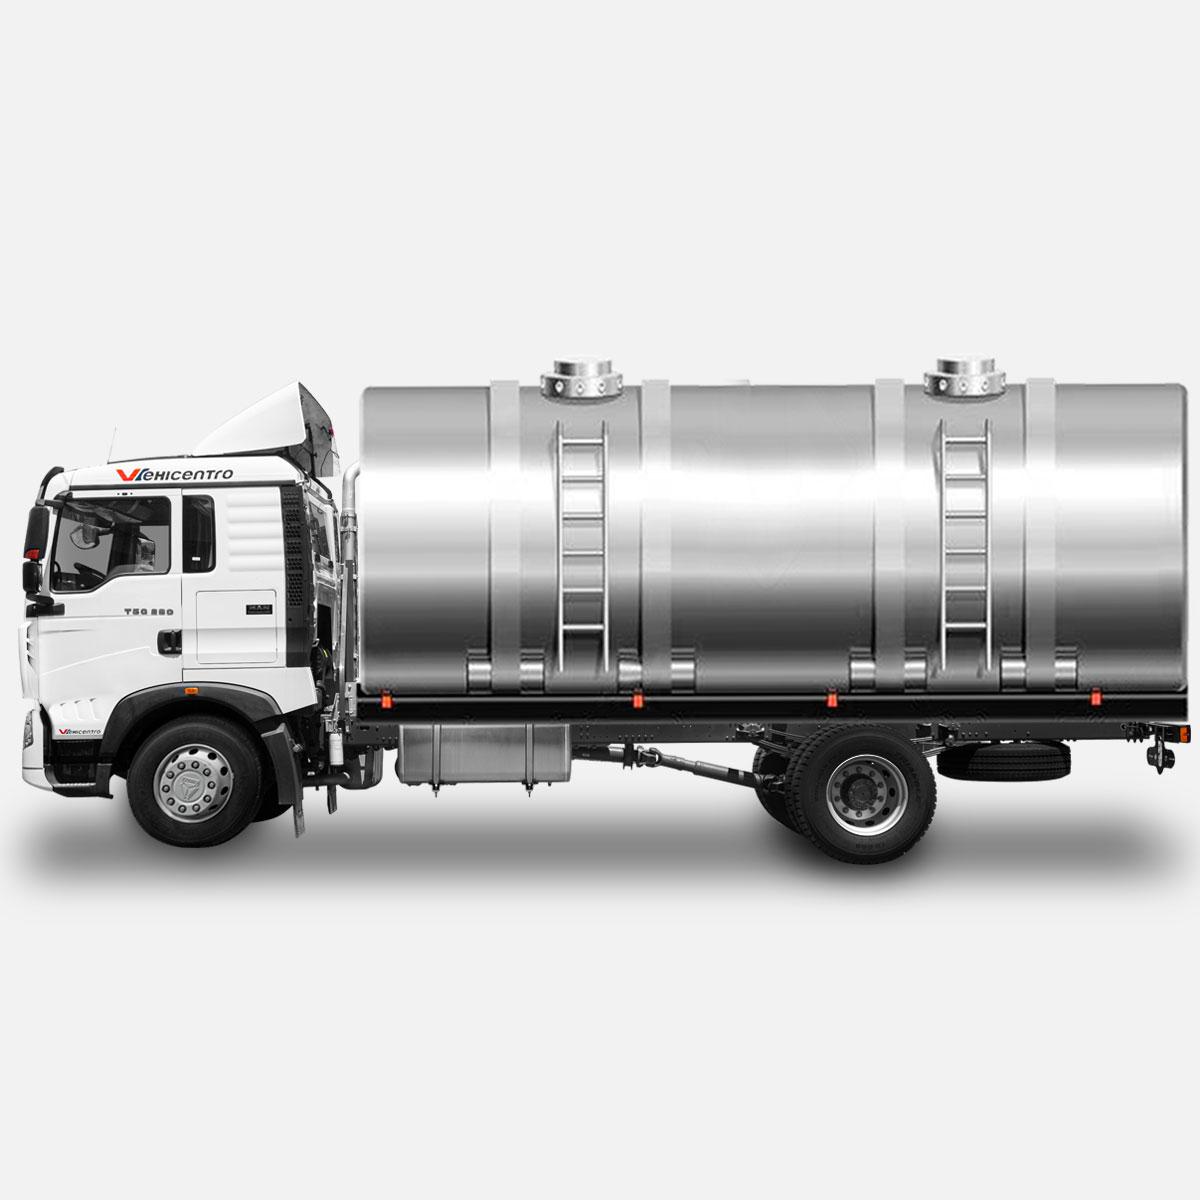 camion de 13 toneladas aplicaciones 1